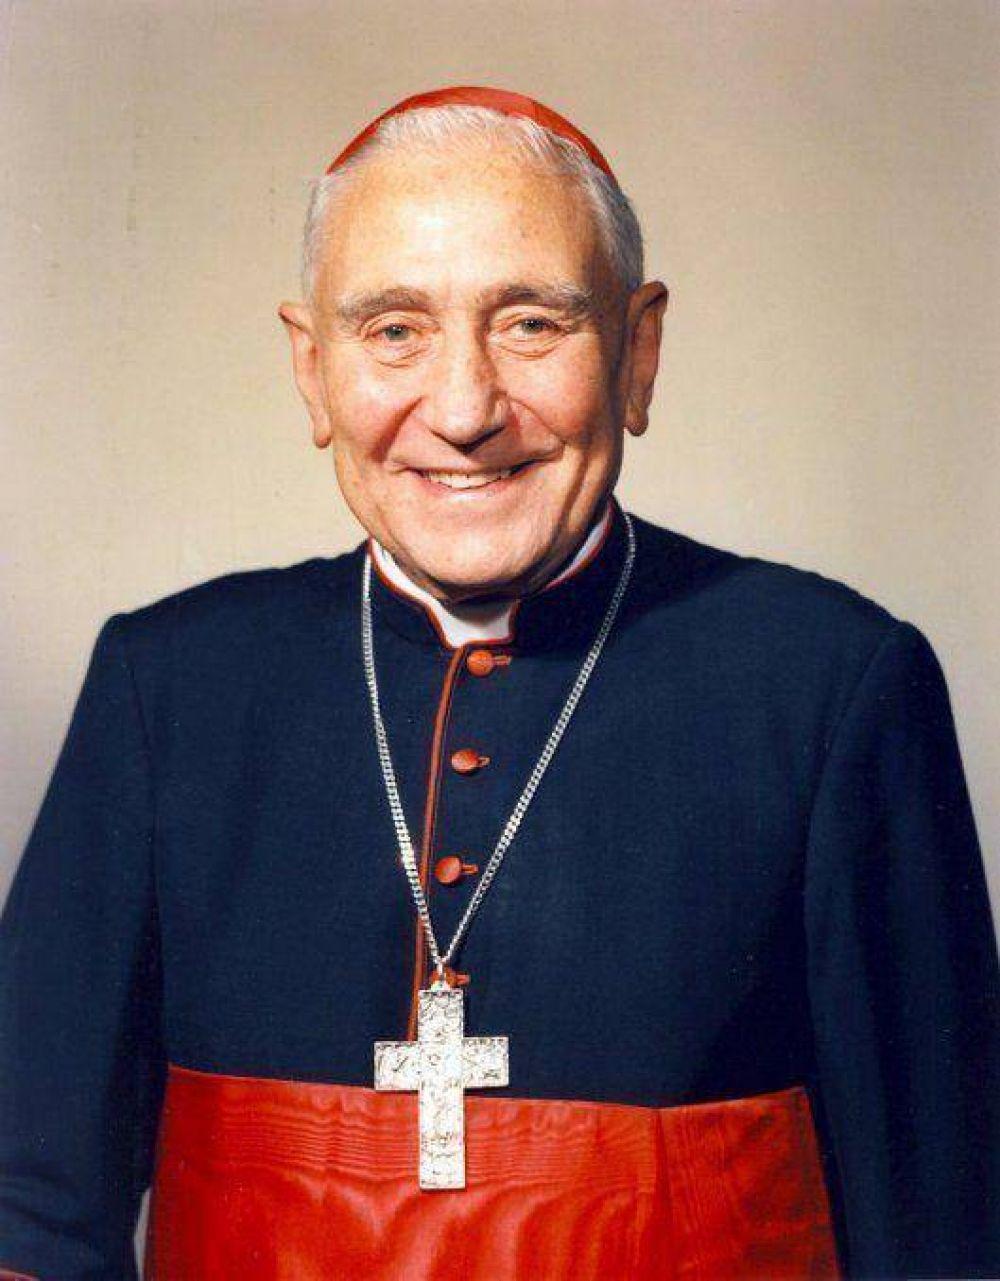 Podrían convertir en beato a un Cardenal por la milagrosa curación de un nene intoxicado con purpurina